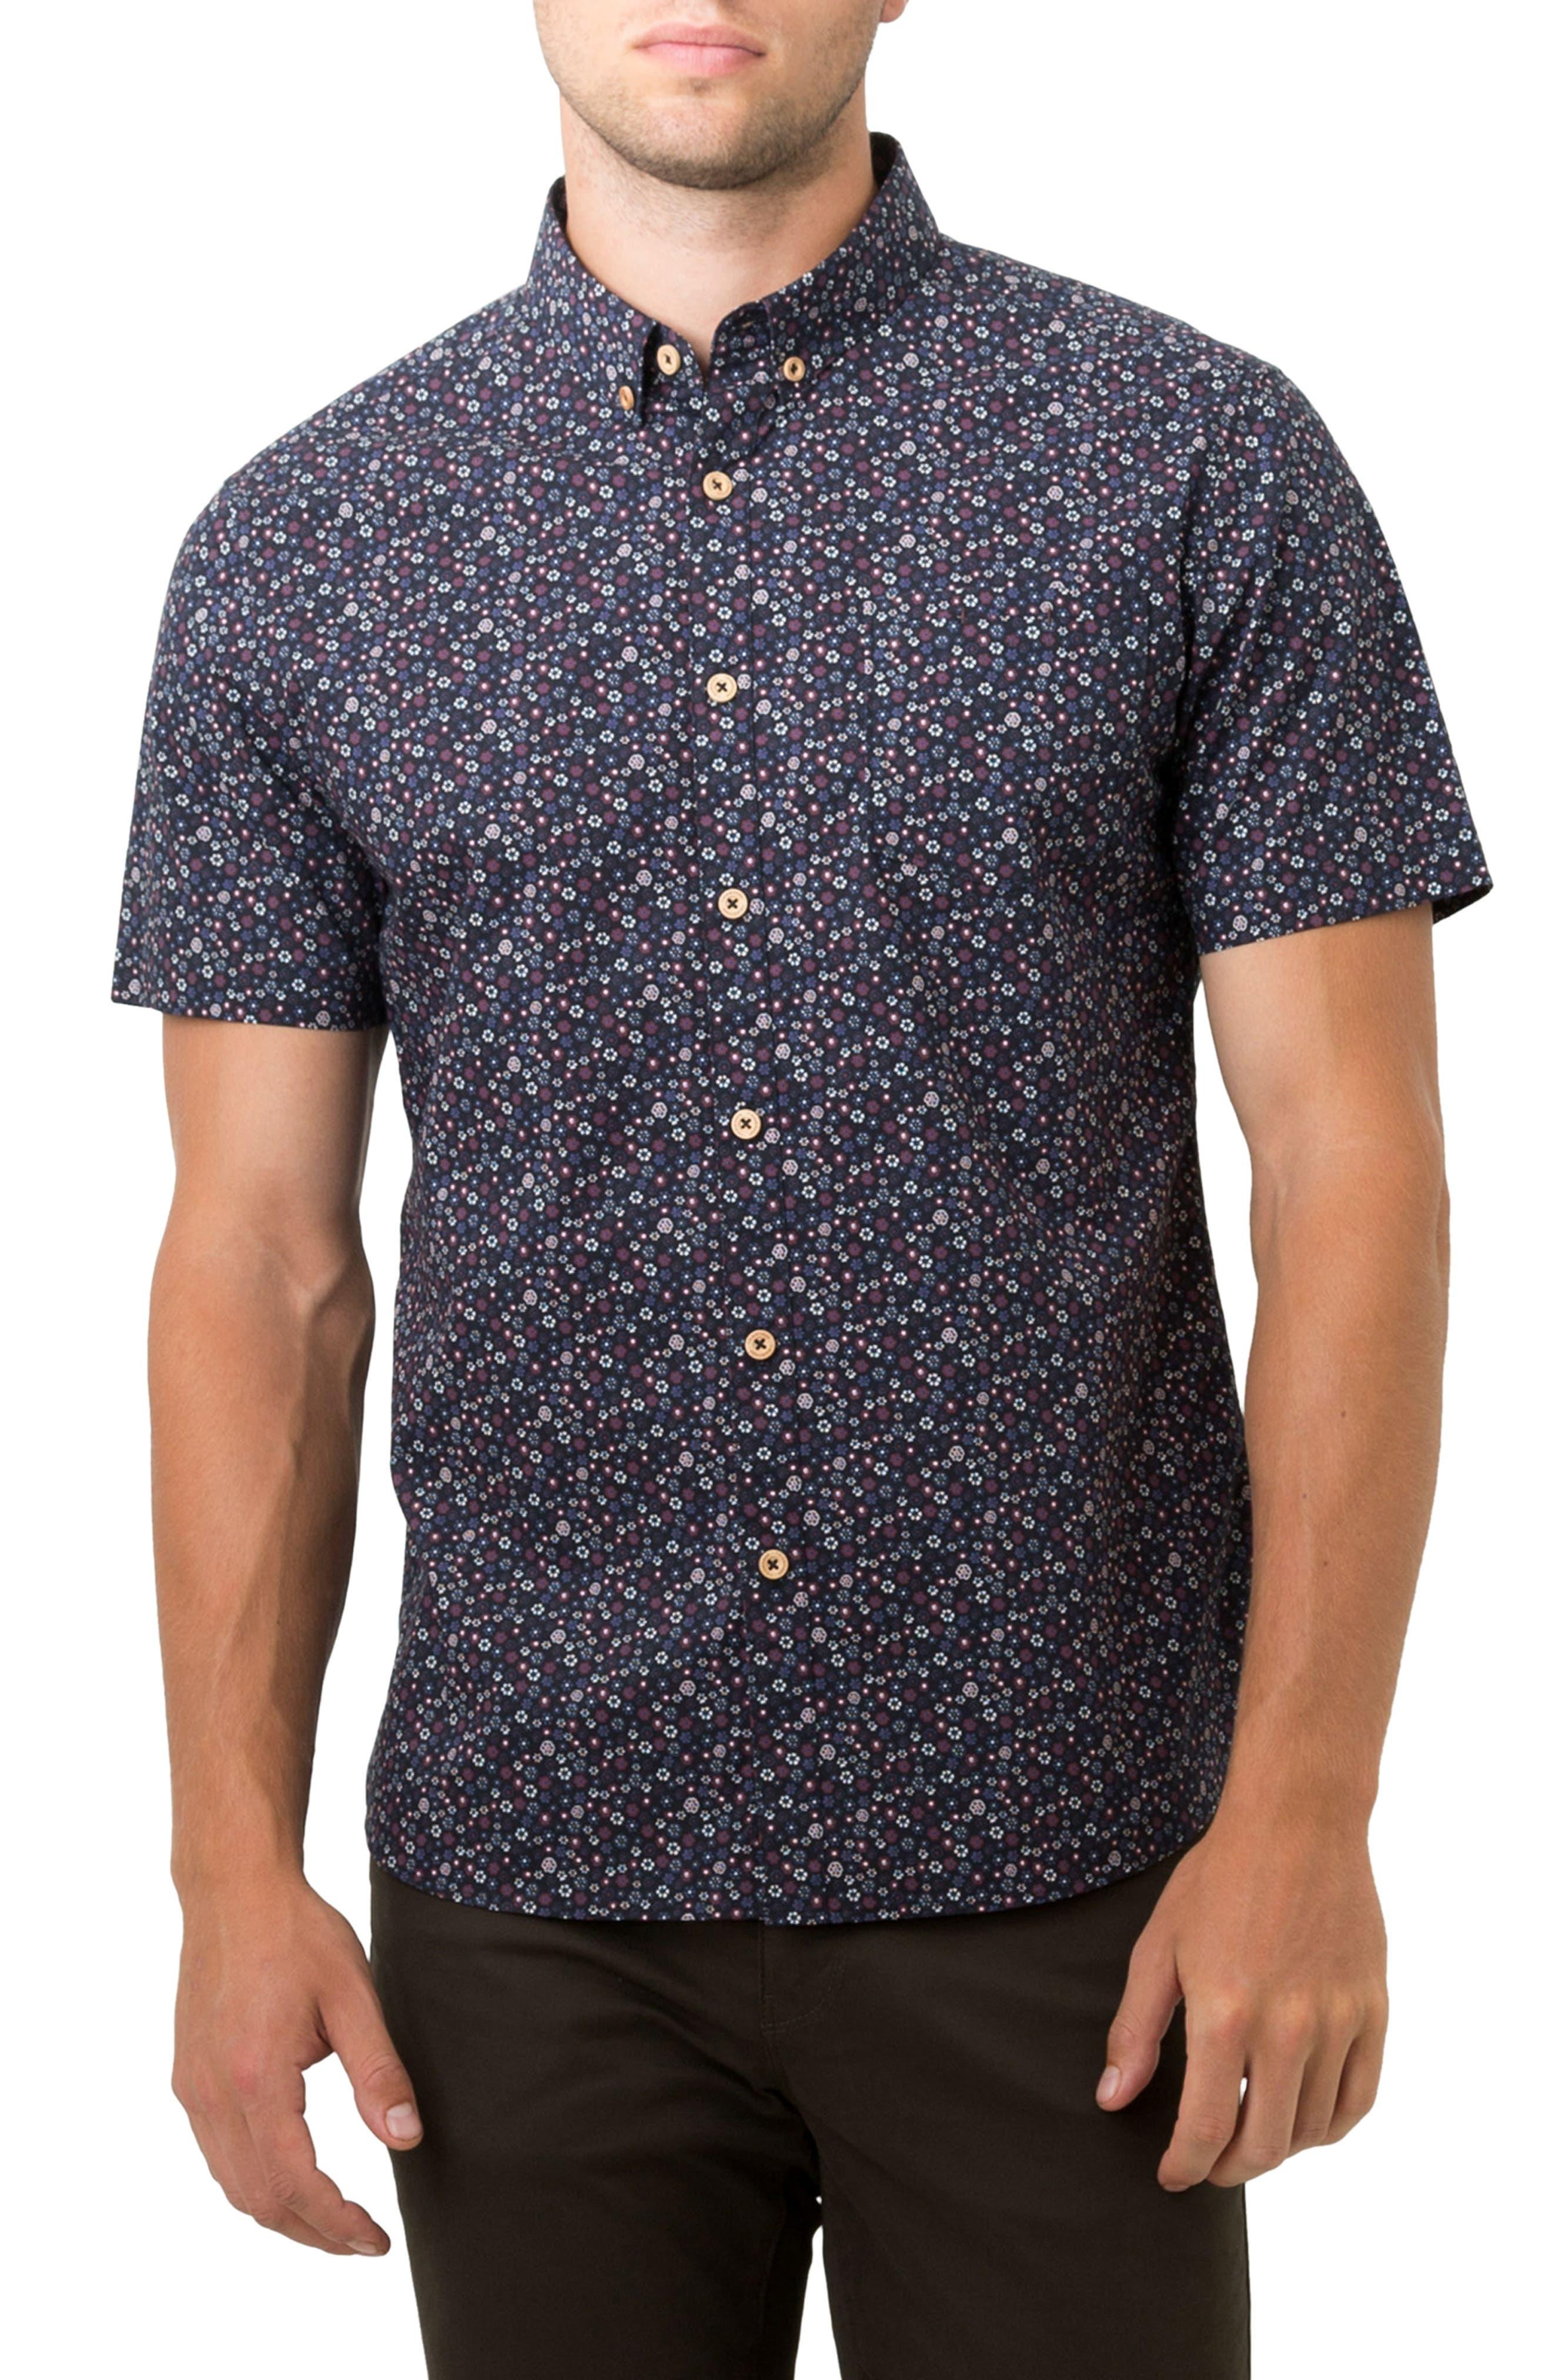 Pure Luck Woven Shirt,                             Main thumbnail 1, color,